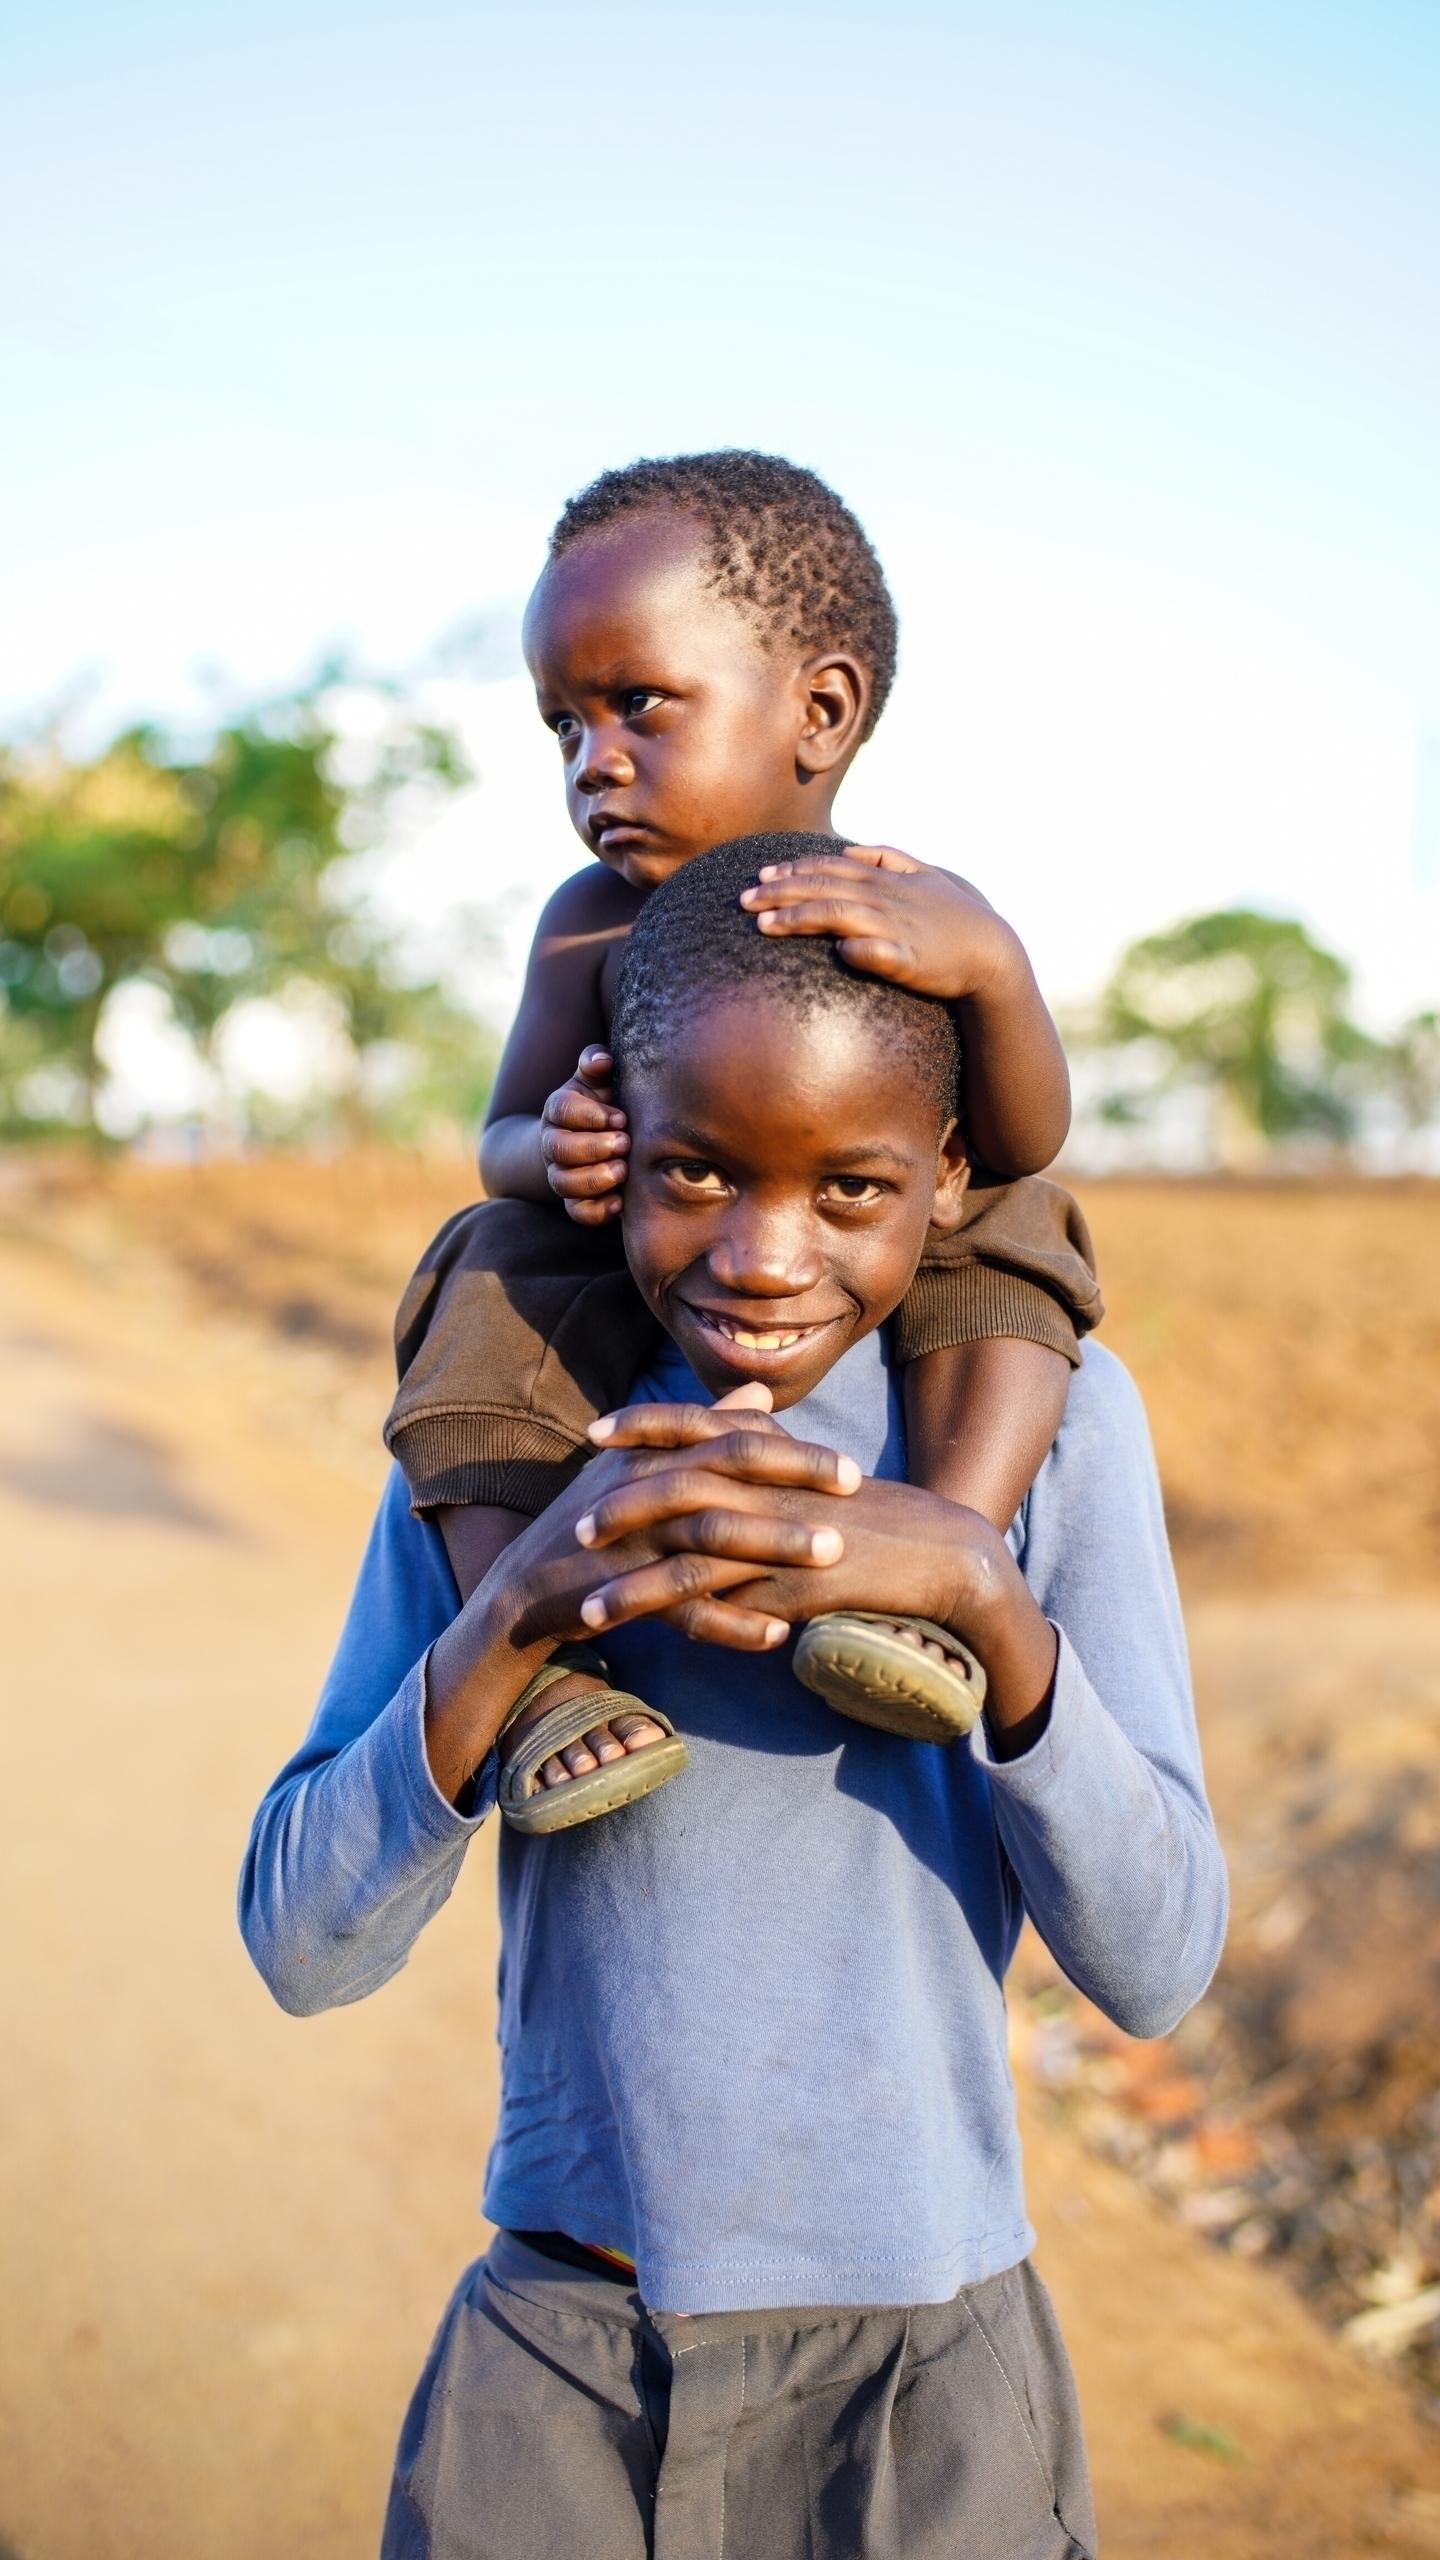 Malawi   - africa, malawi, TravelPics - sr27pakbird   ello